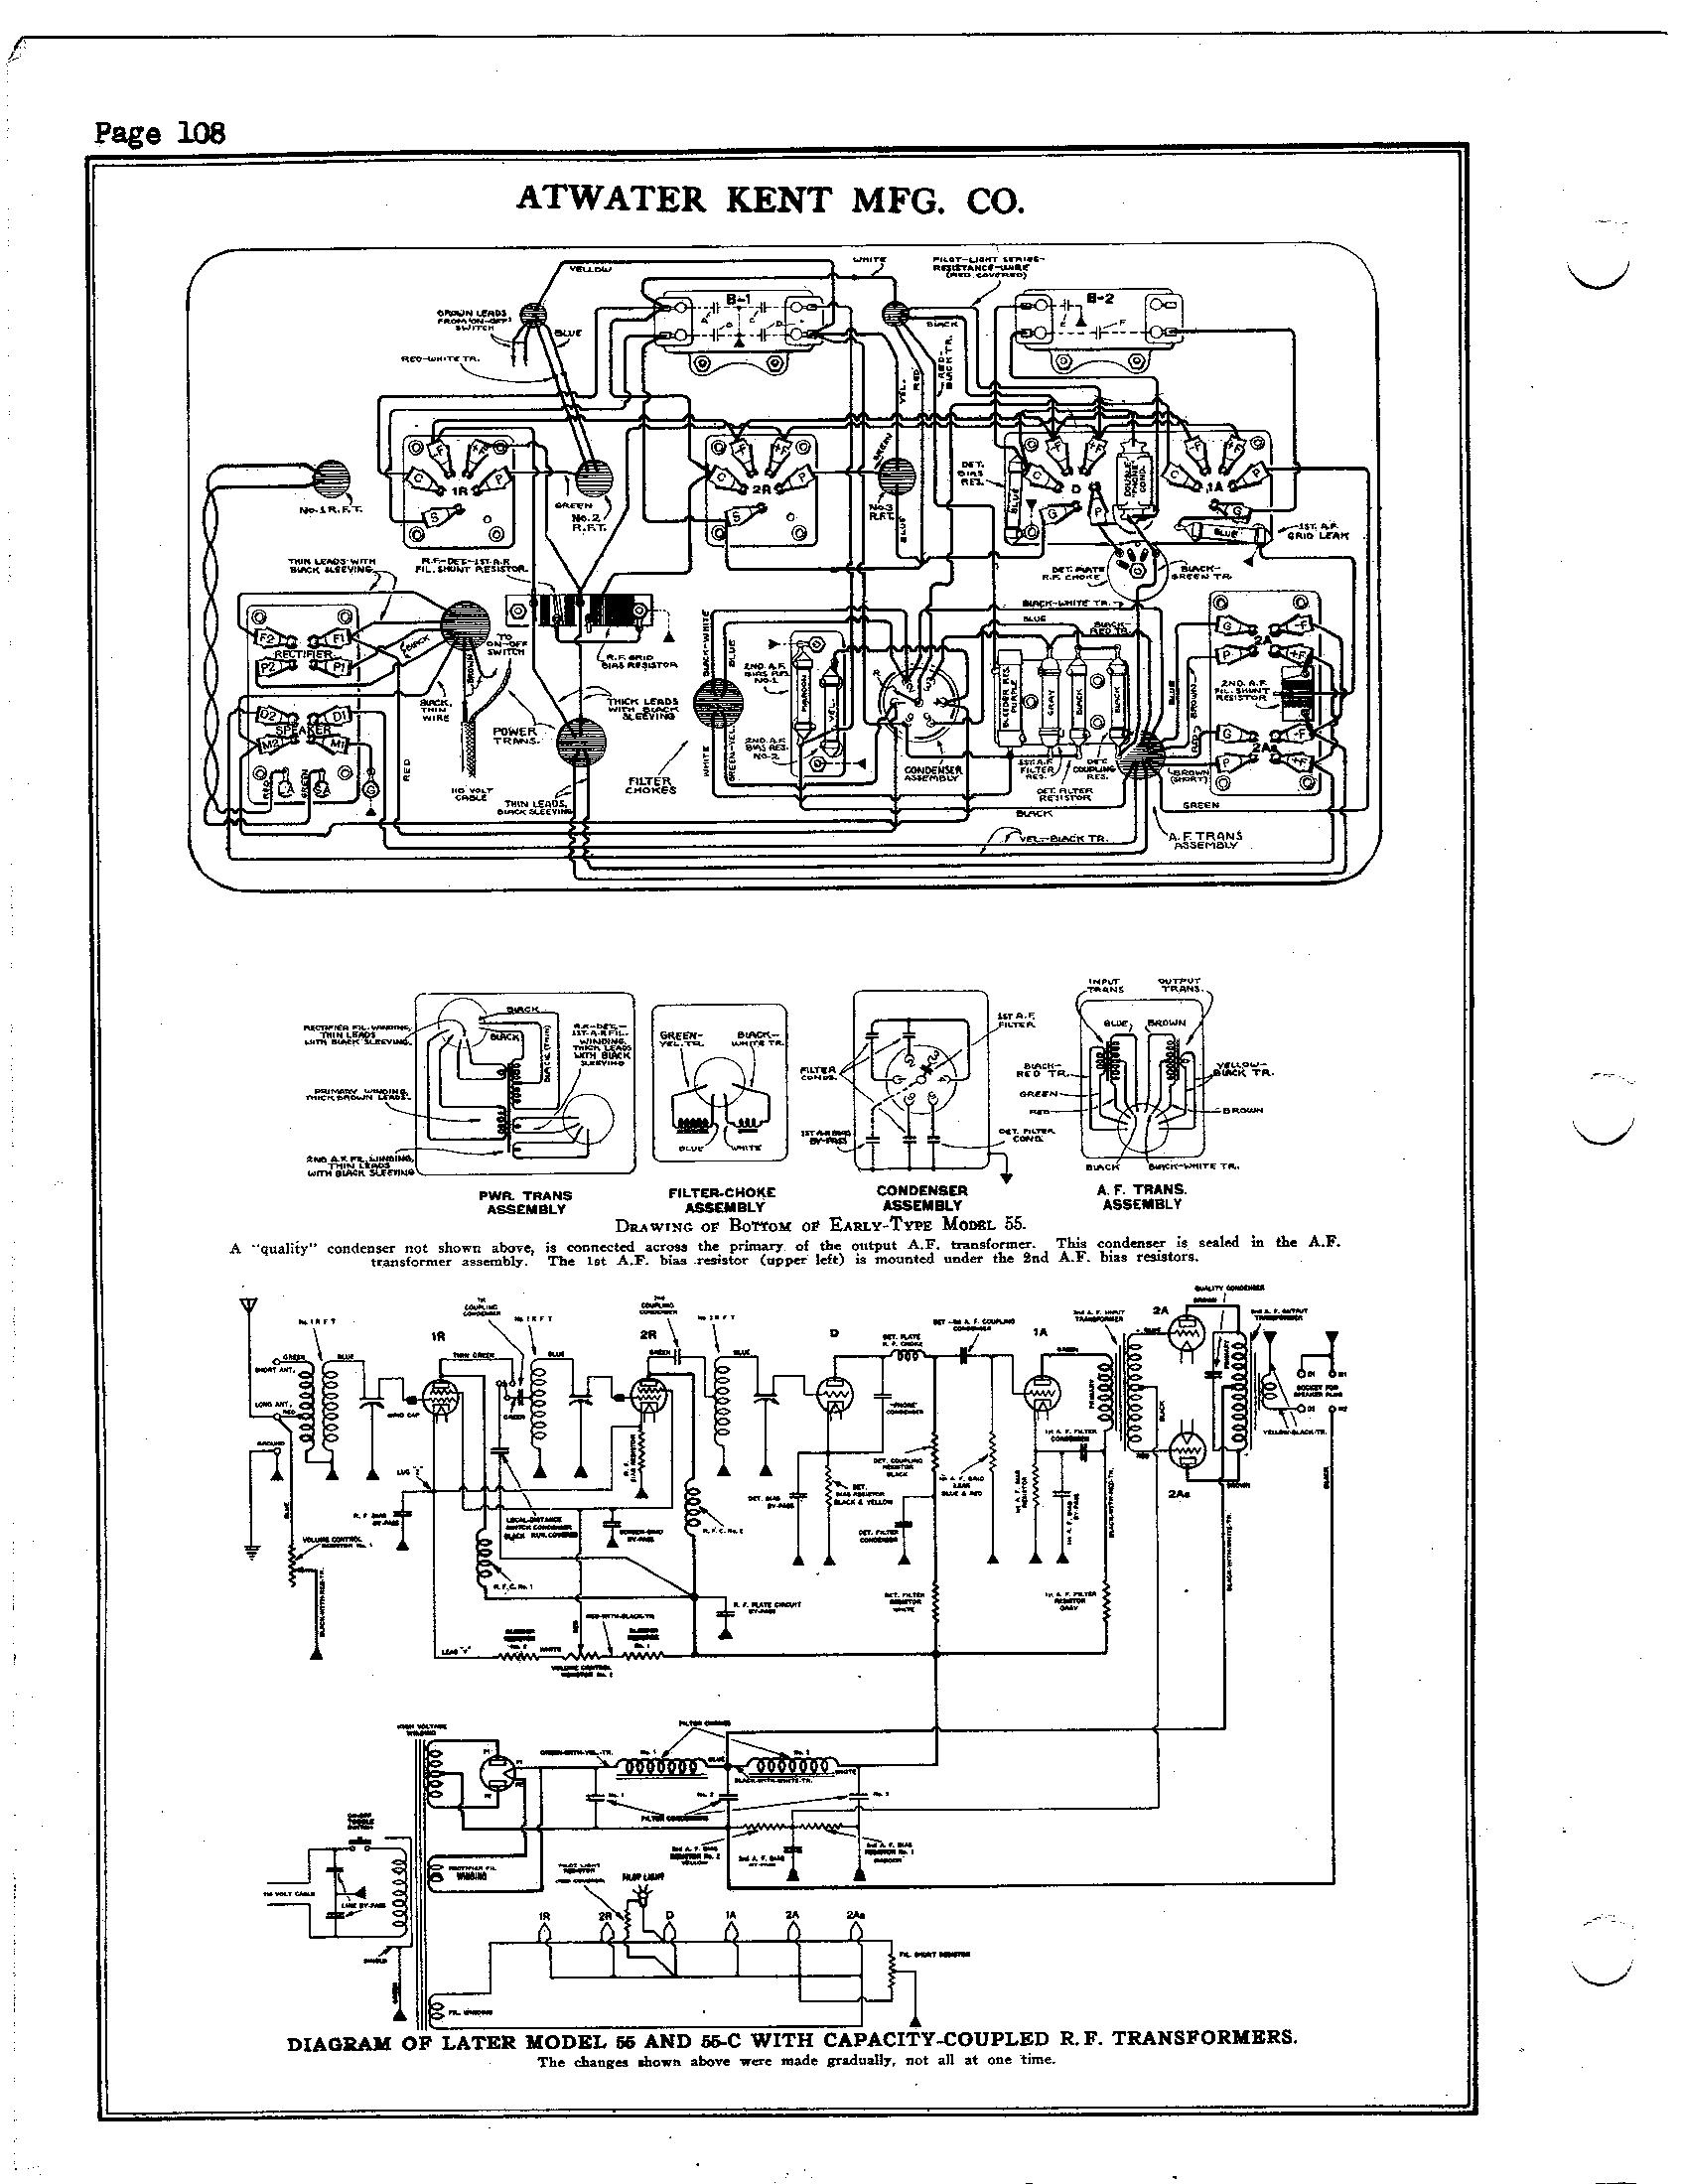 asv pt80 wiring diagram